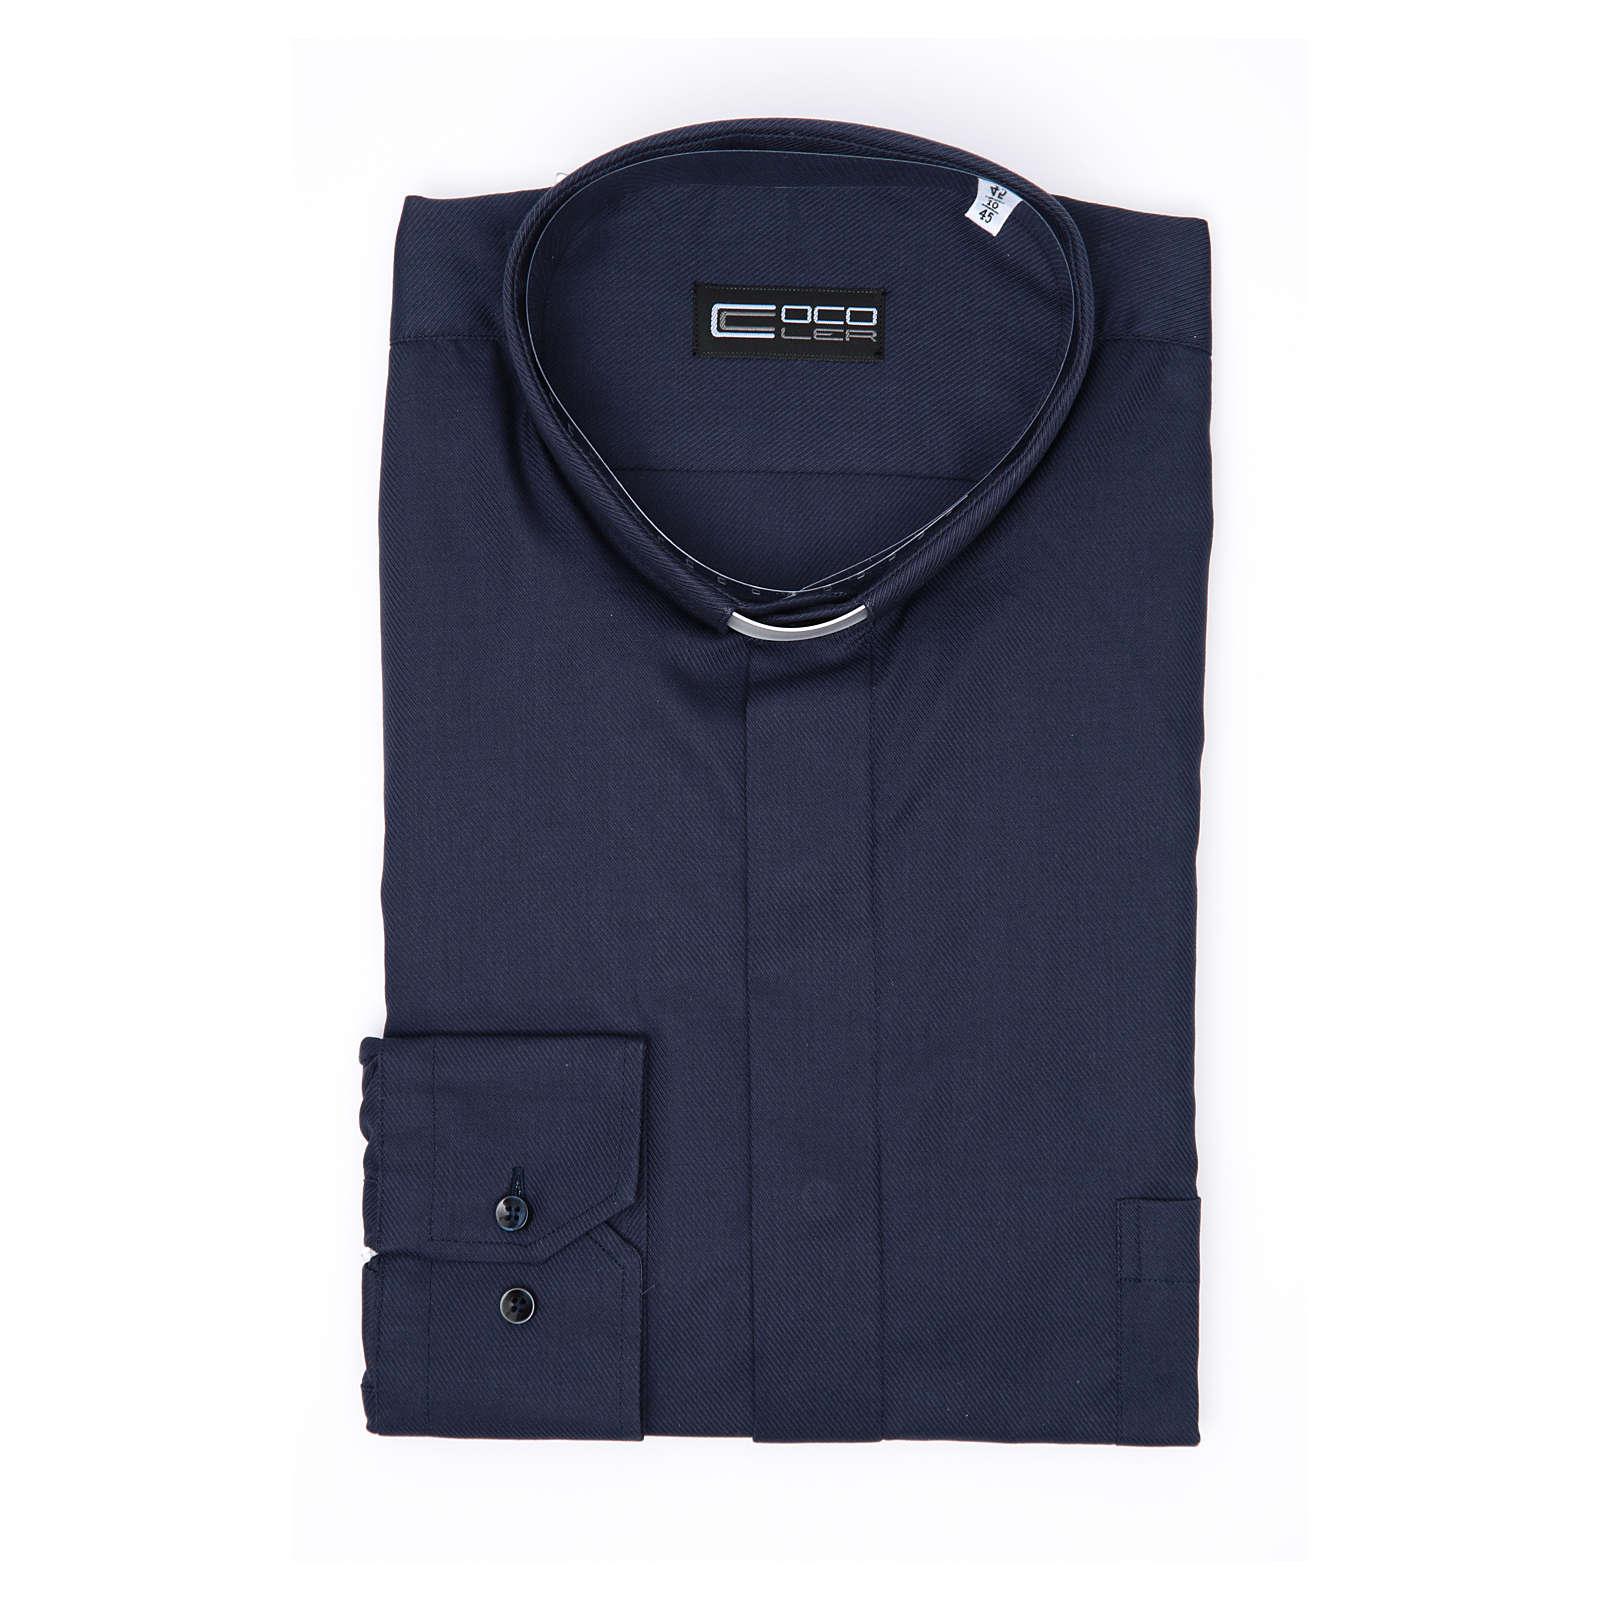 Camisa Clergy Manga Larga Planchado Facil Diagonal Mixto Algodón Azul 4